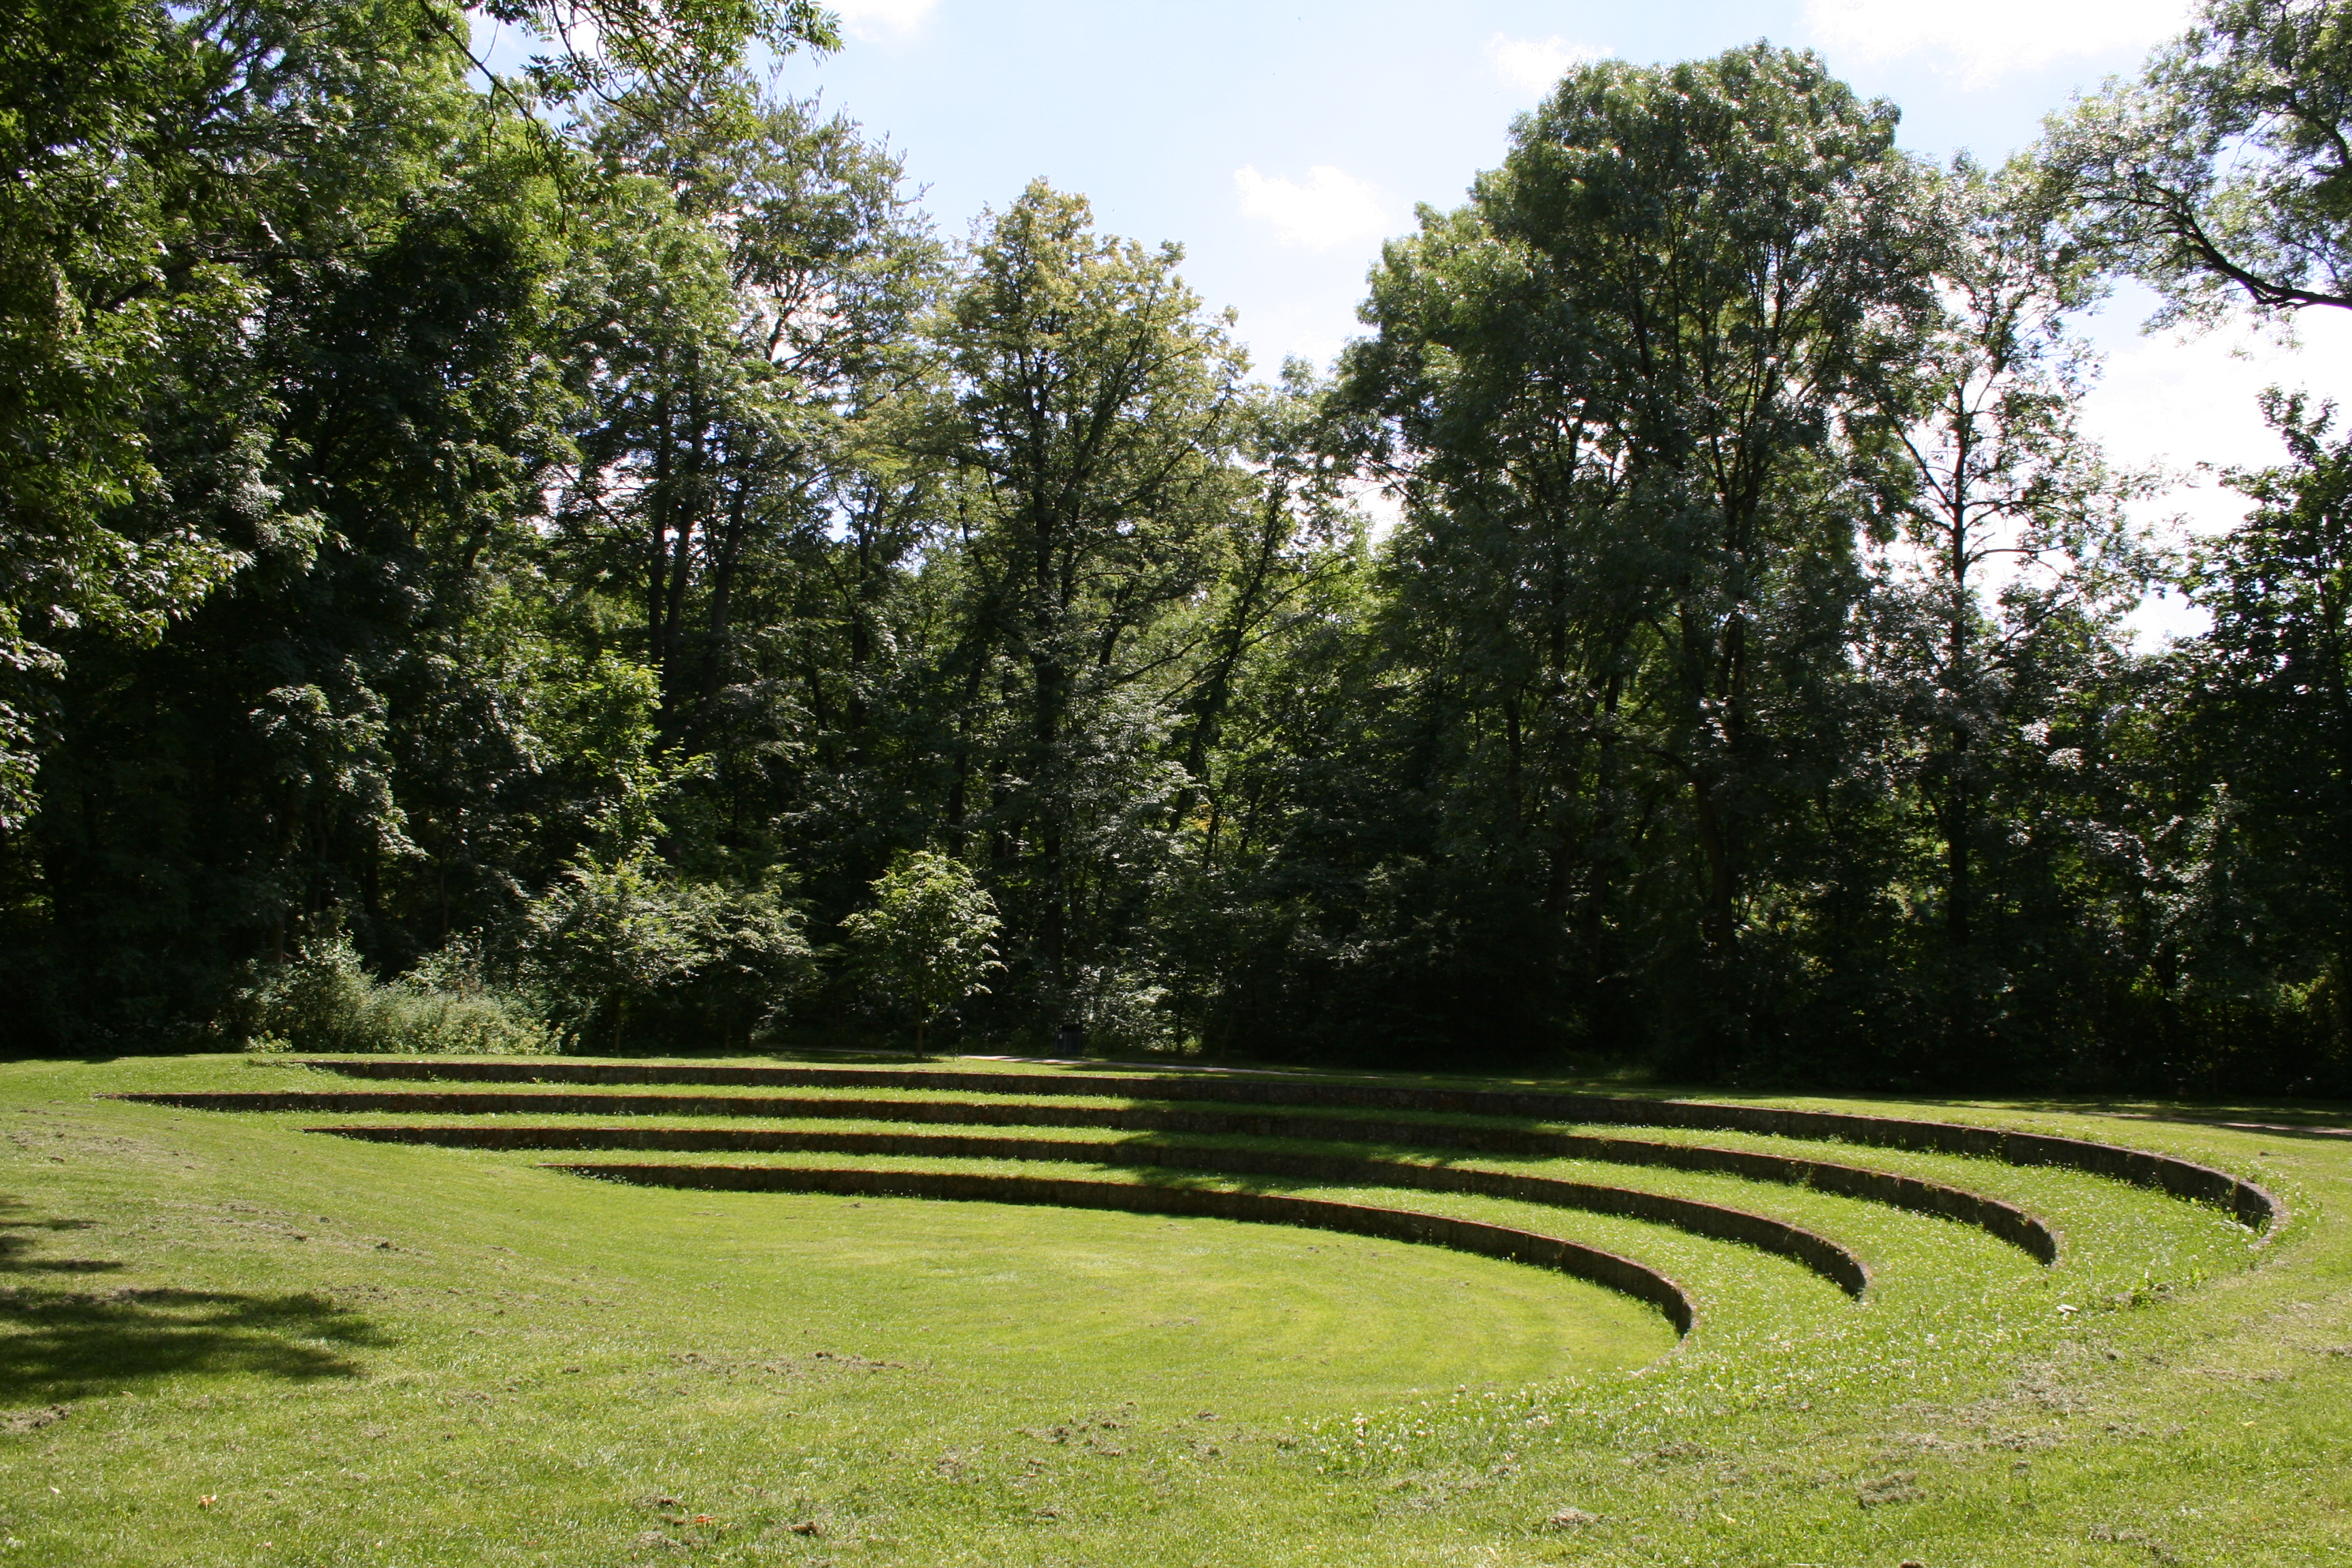 Small Garden Amphitheaters 3456 x 2304